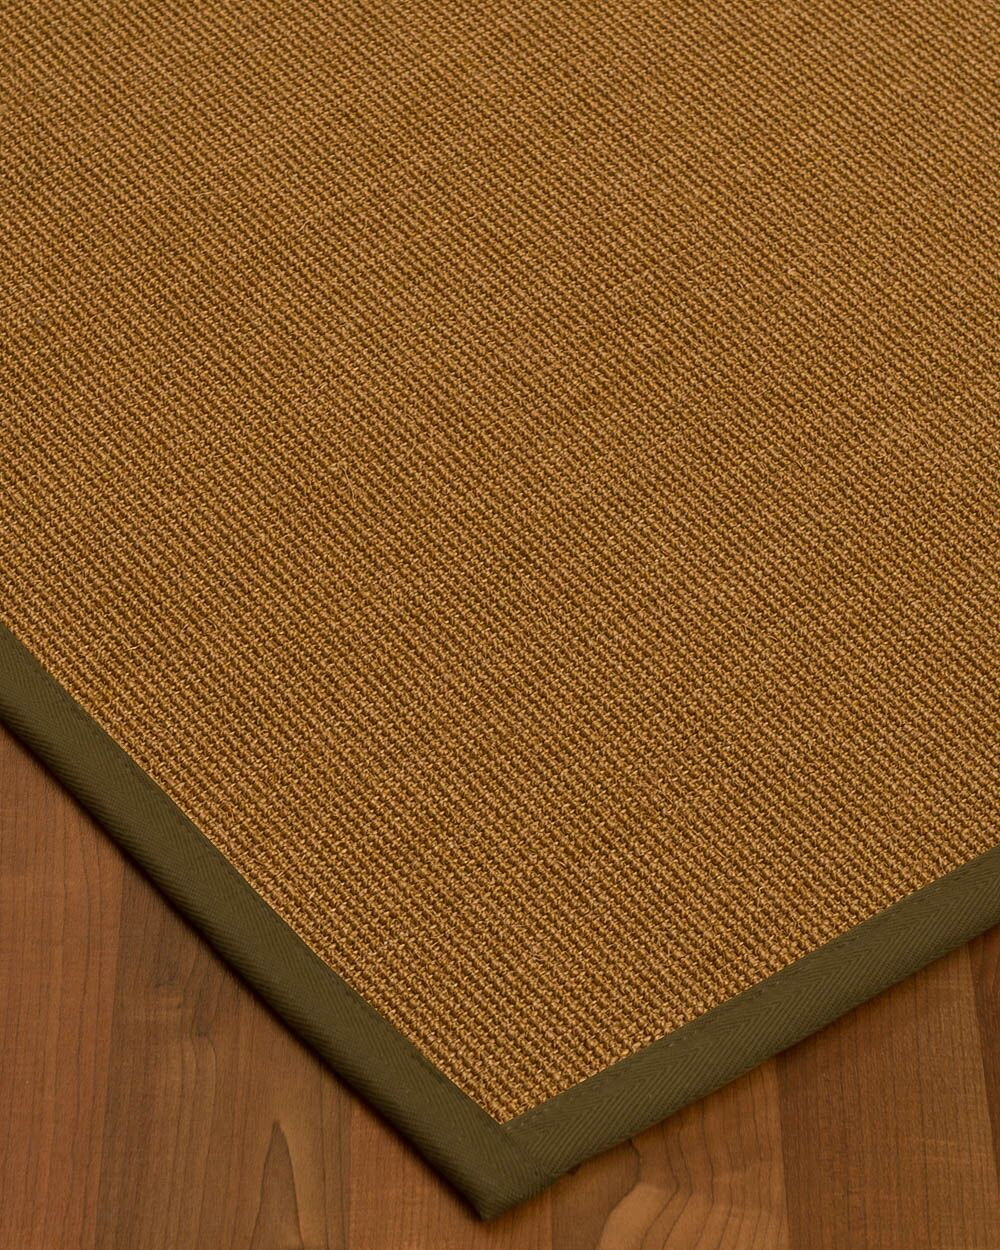 Antonina Border Hand-Woven Brown/Malt Area Rug Rug Size: Rectangle 4' x 6', Rug Pad Included: Yes